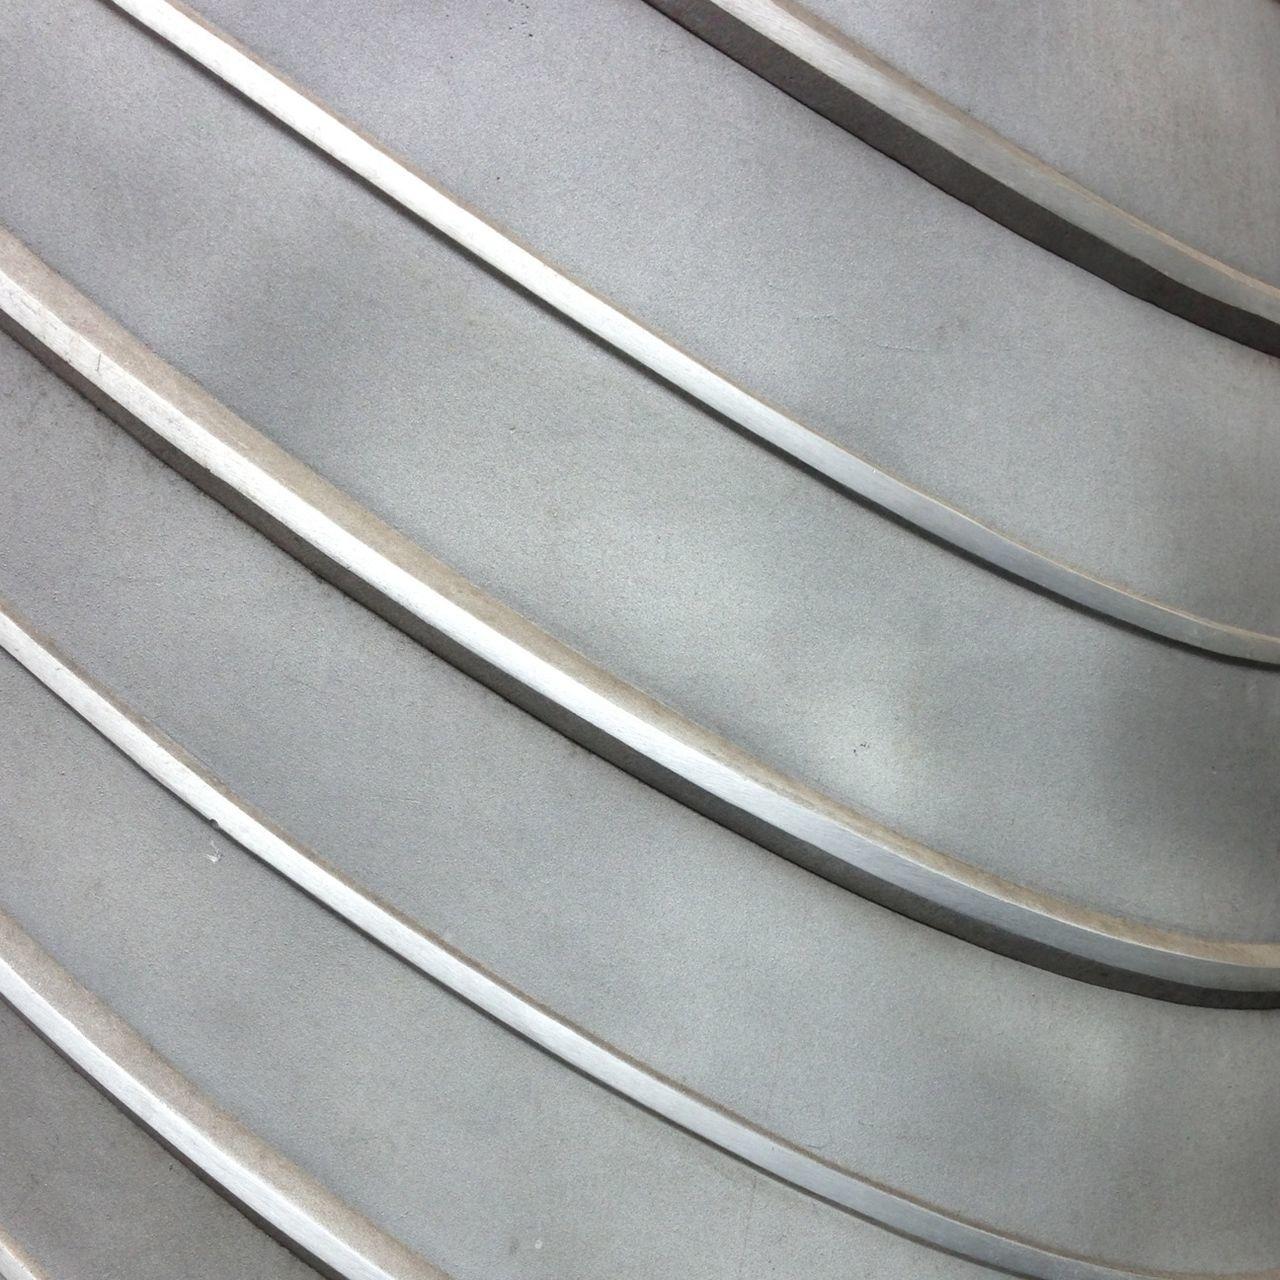 Close-up of detail design of metal